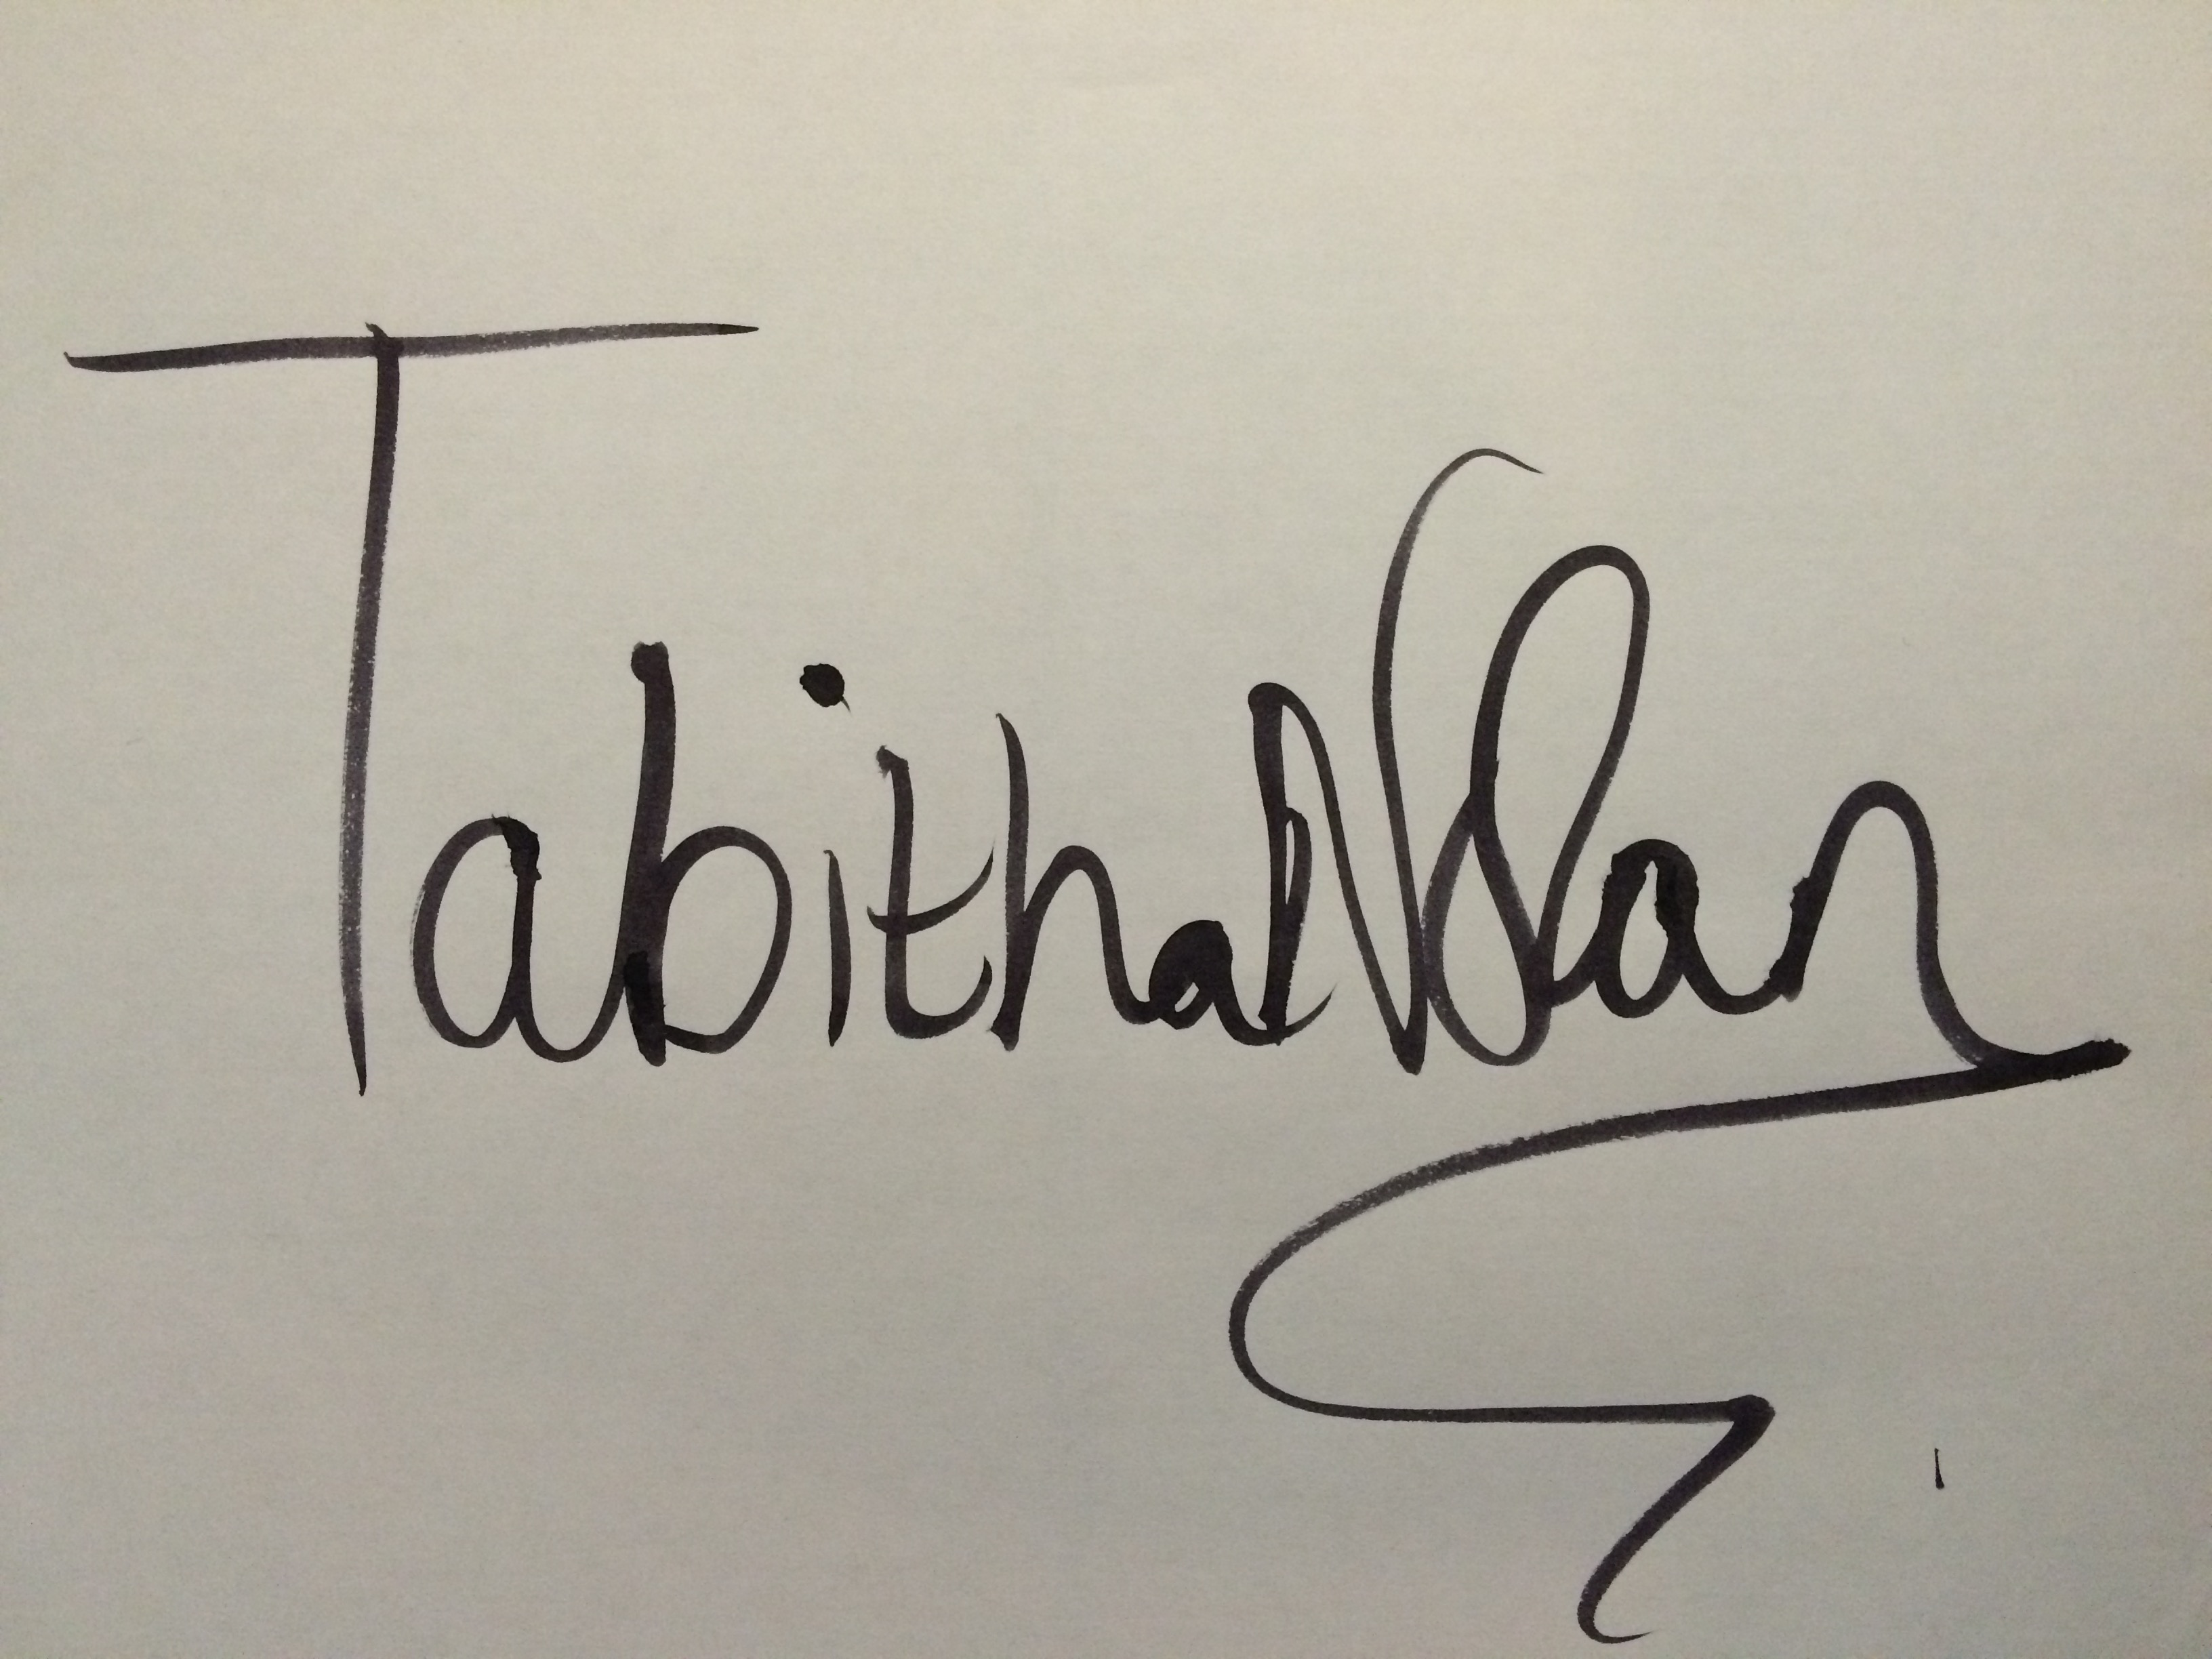 tabitha nolan Signature